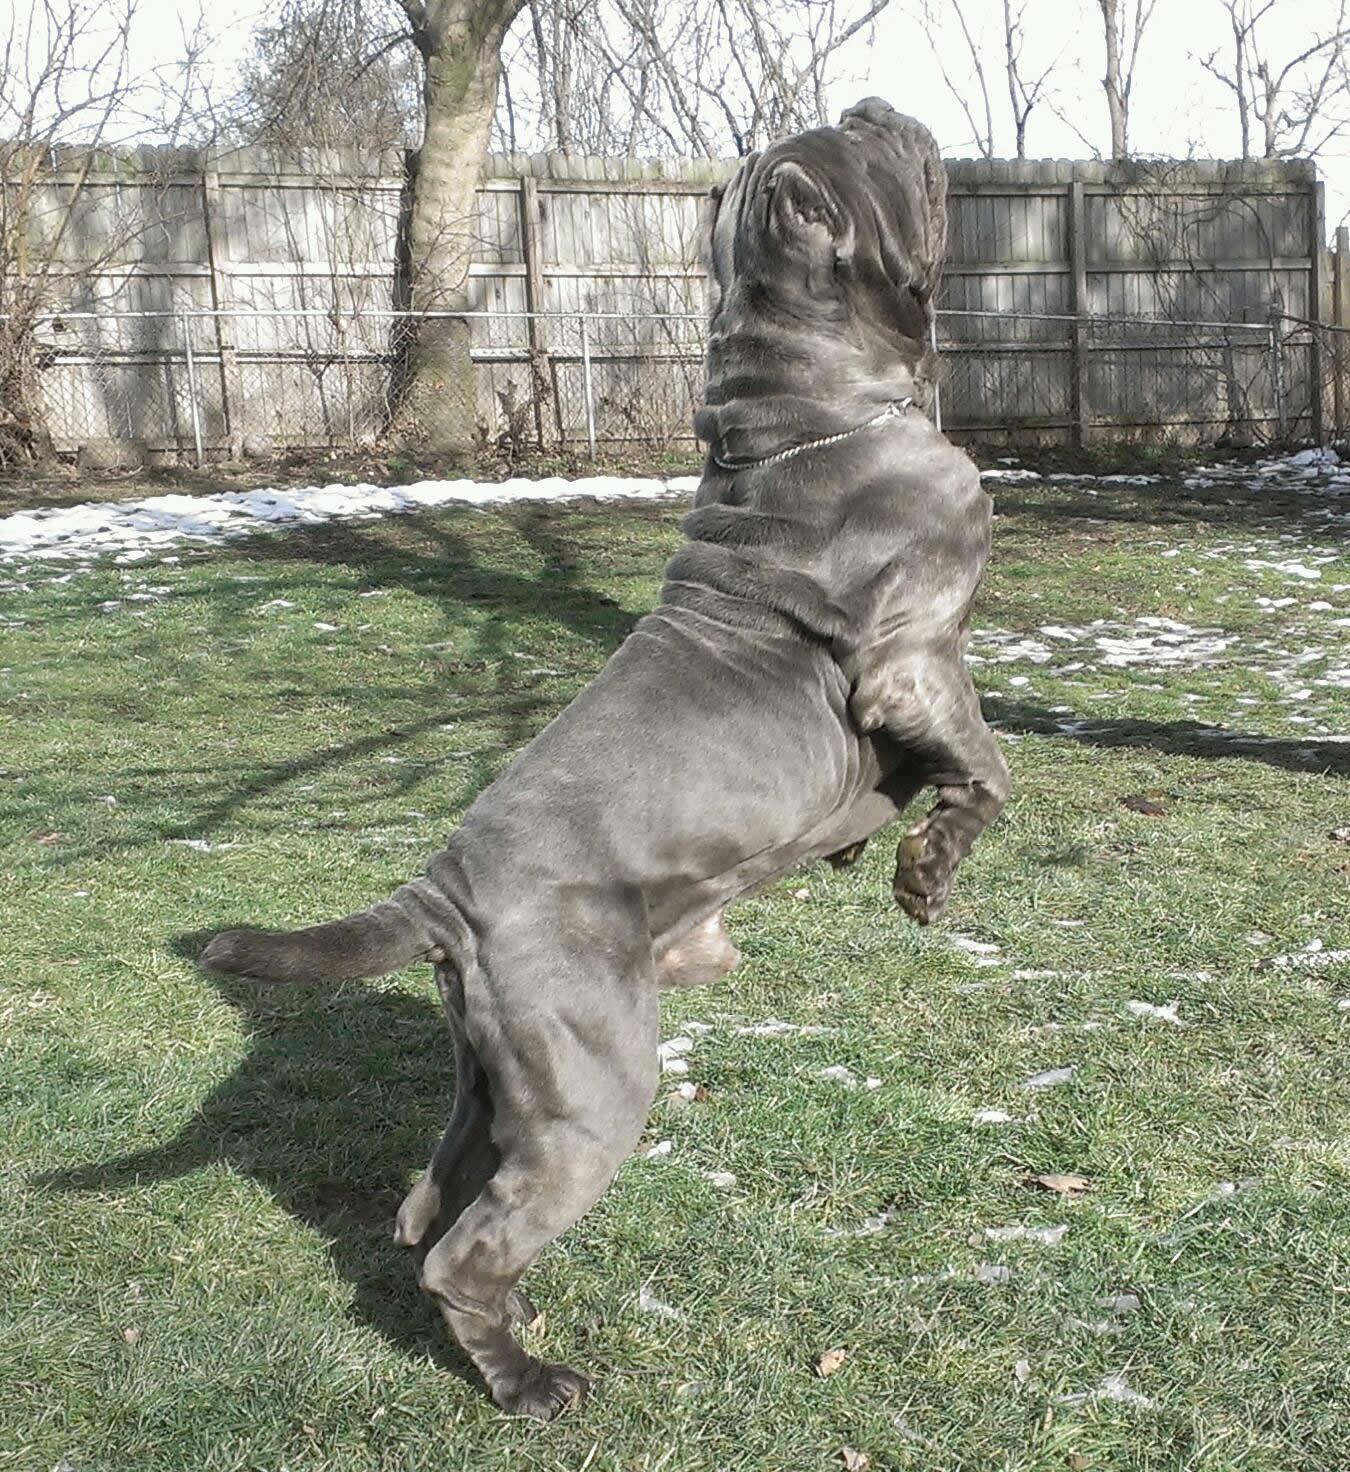 Severino jumping